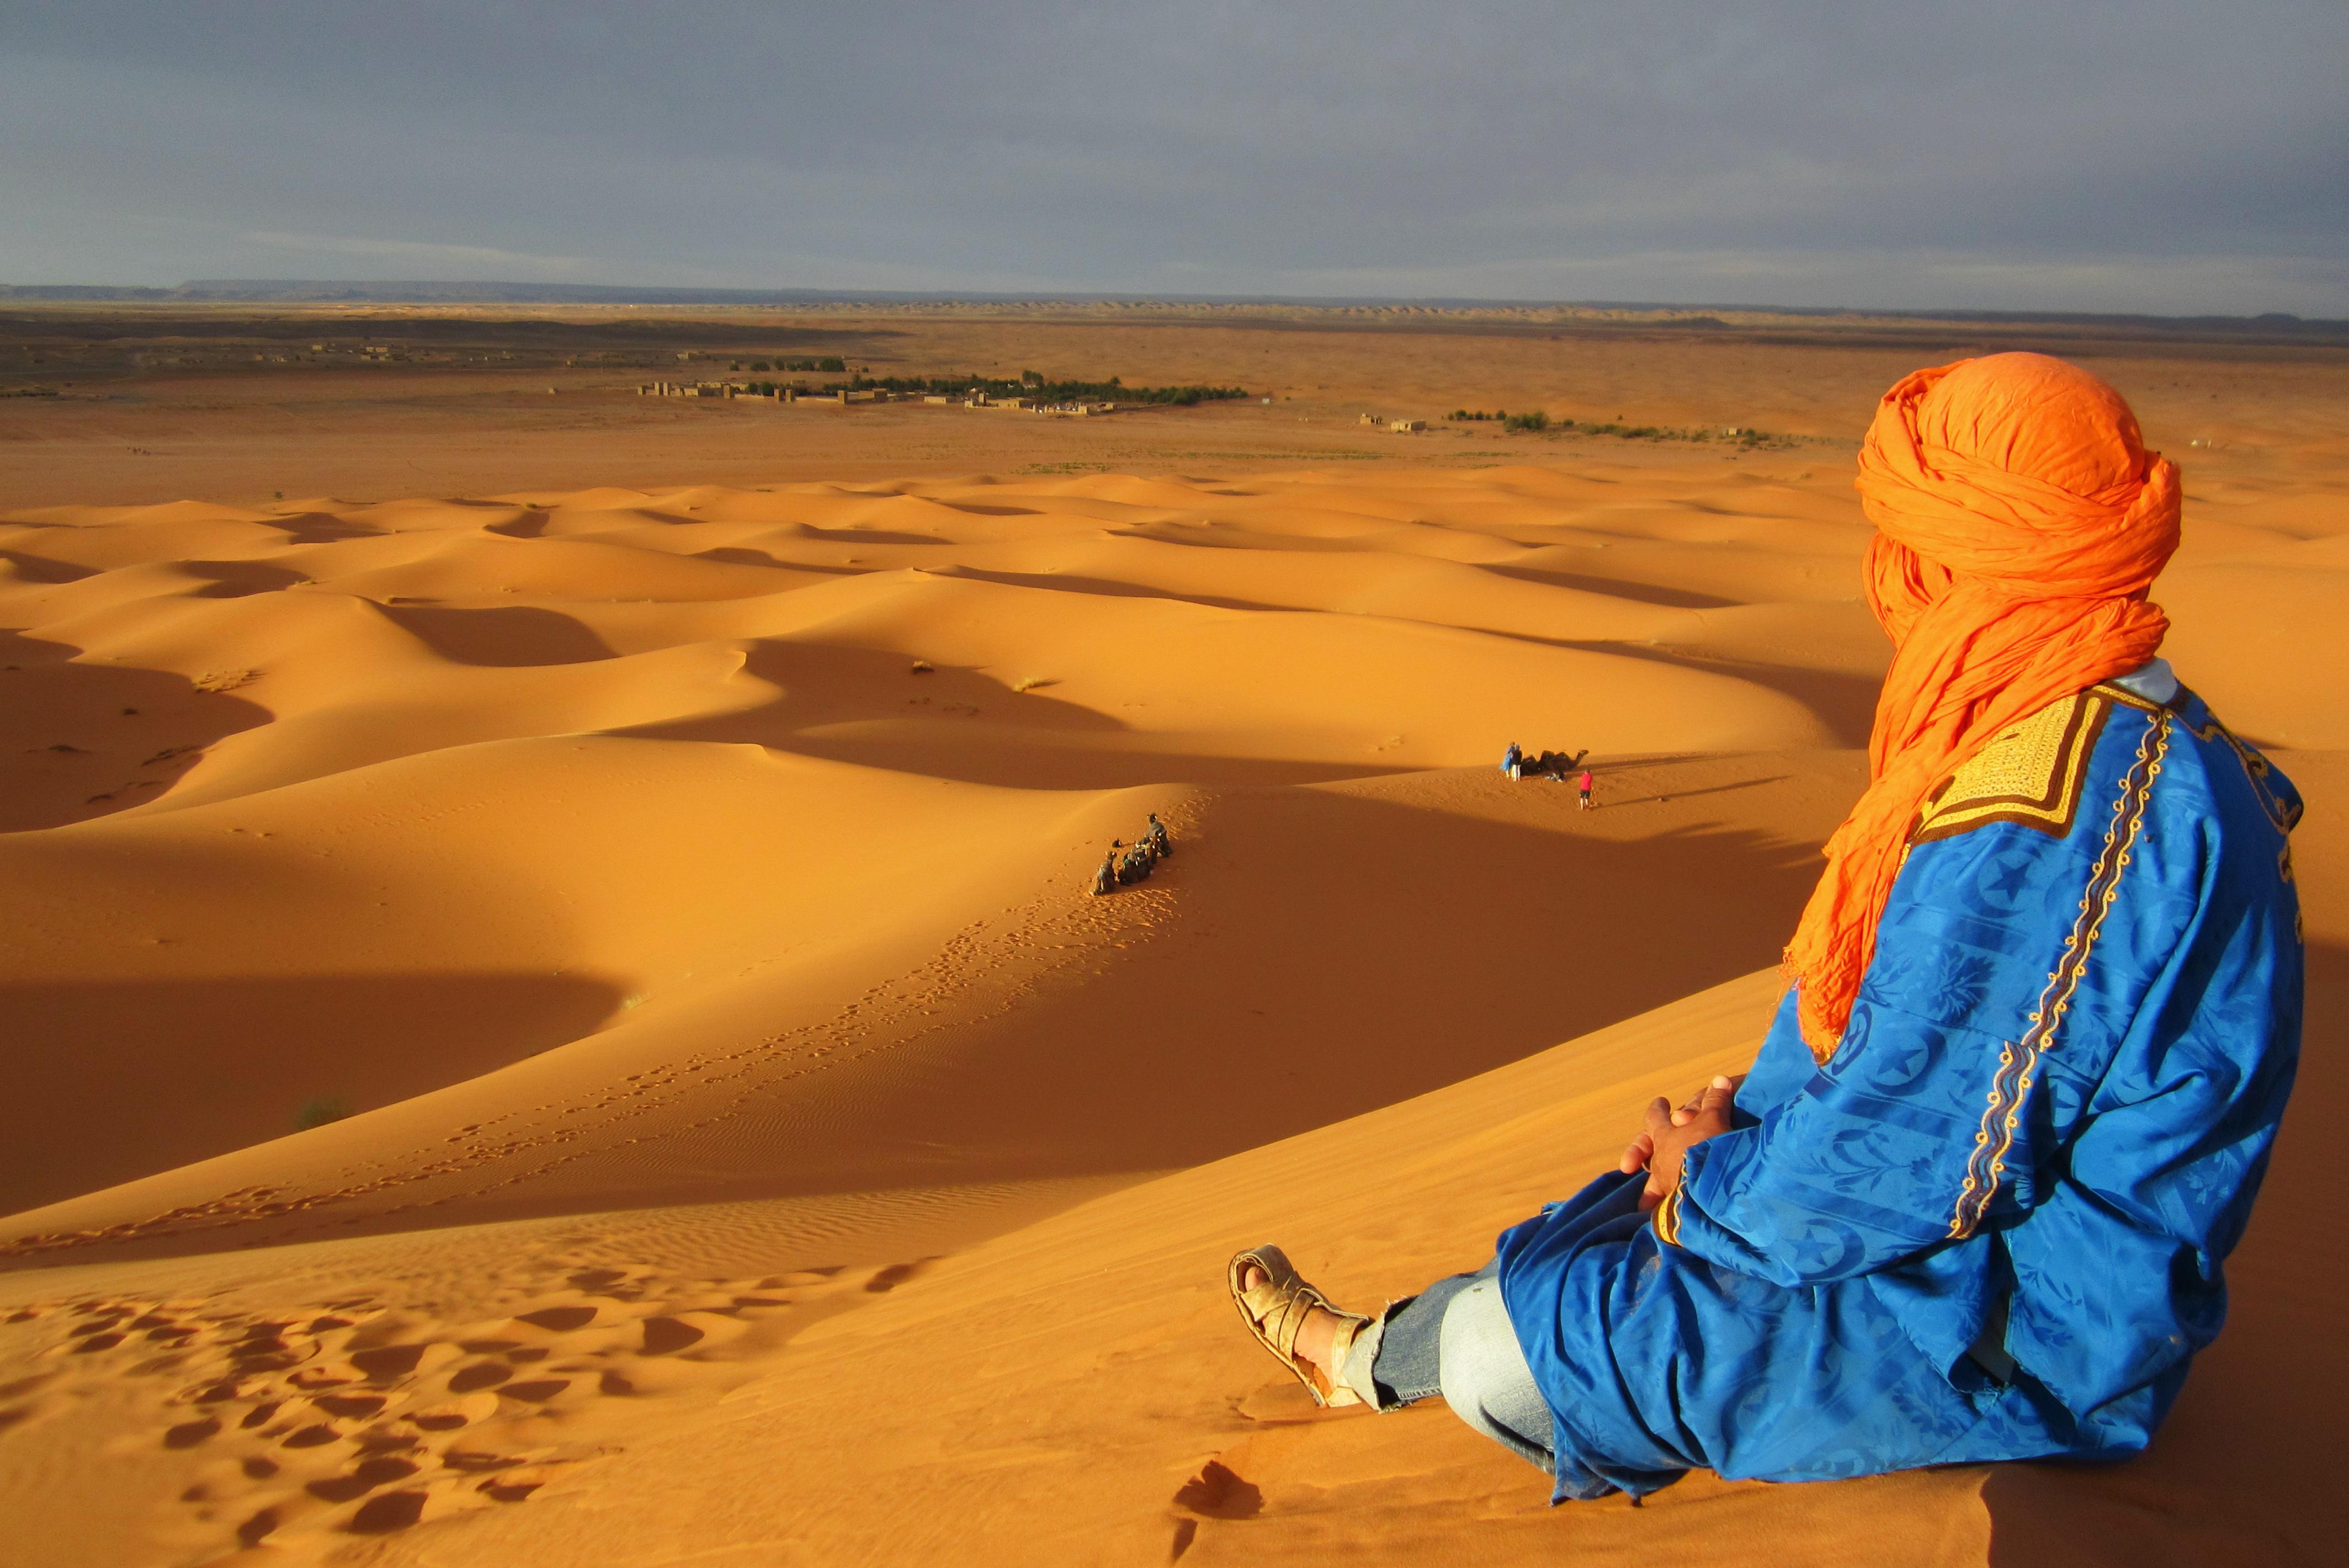 berber in the moroccan desert, Merzouga, Morocco